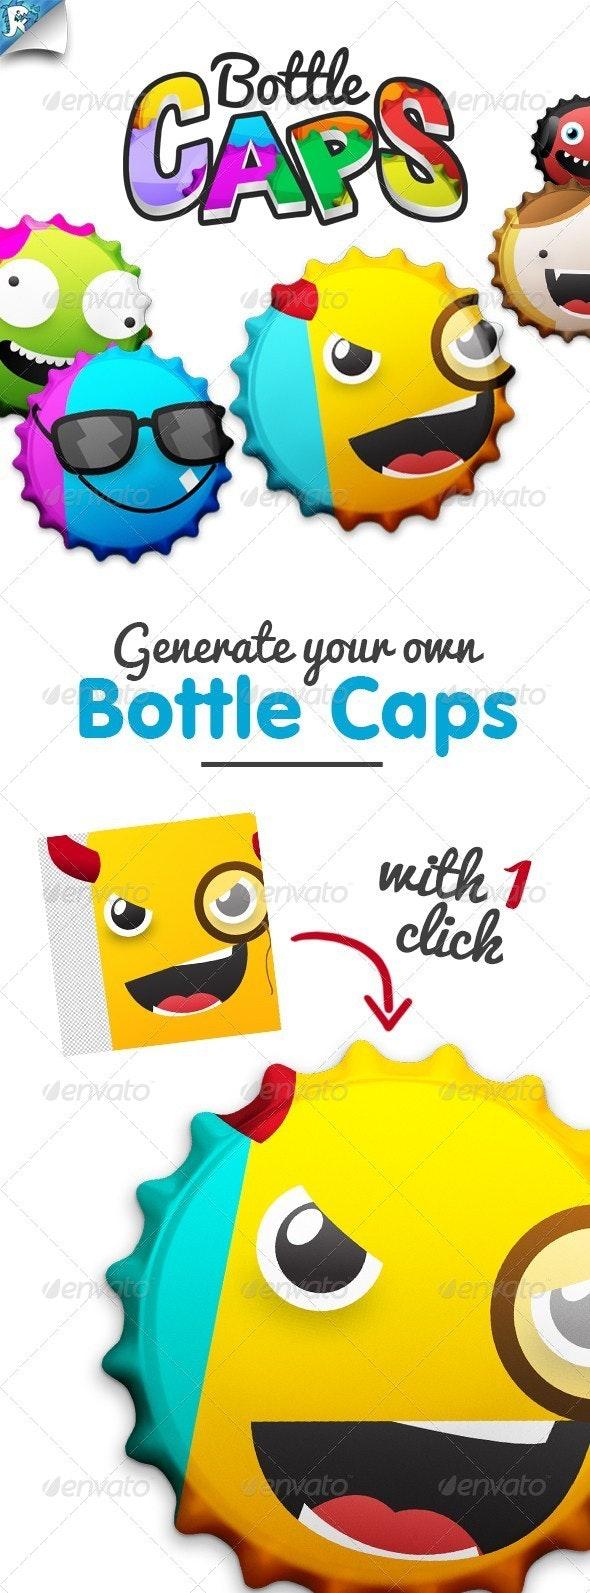 BottleCaps - Bottle Cap Generator - Cap It! - Food and Drink Packaging